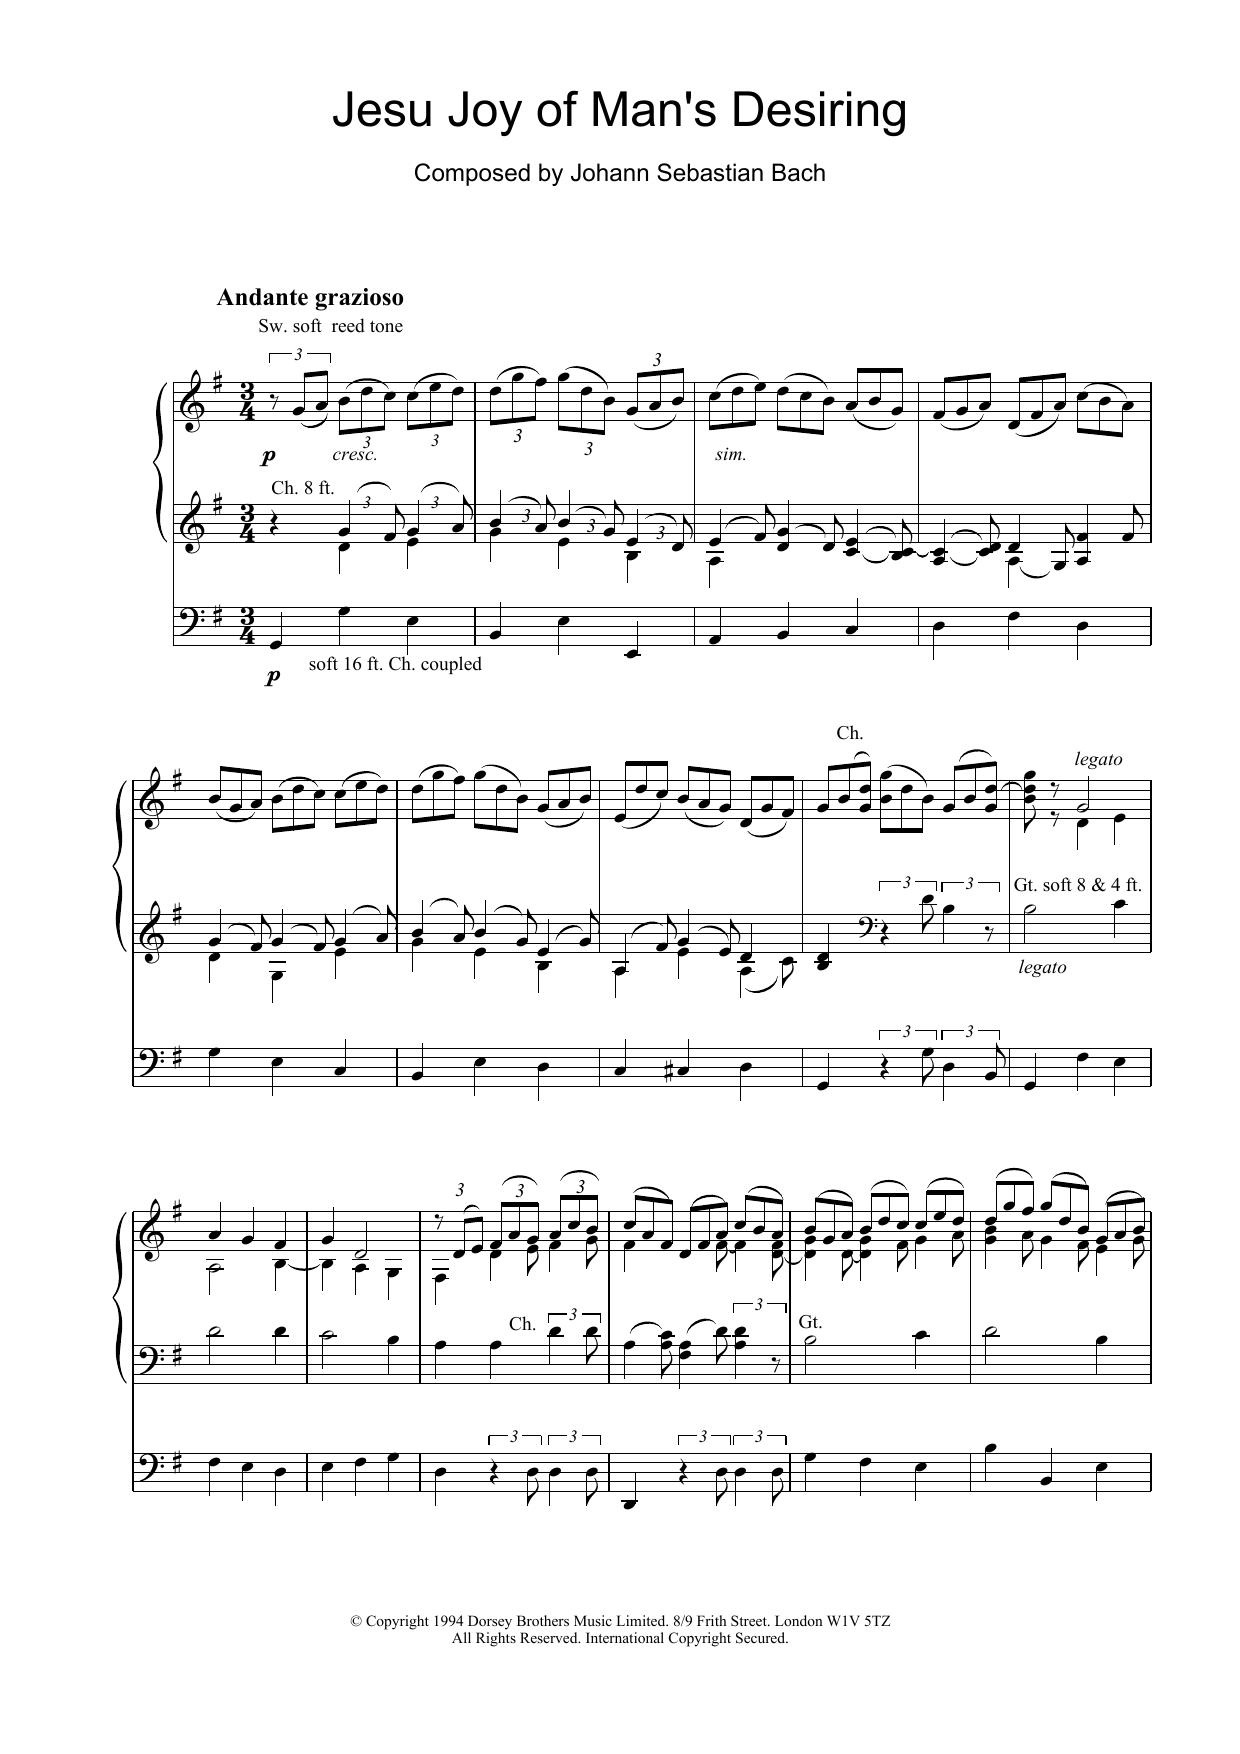 Jesu, Joy Of Man's Desiring (from Cantata 147) | Sheet Music Direct